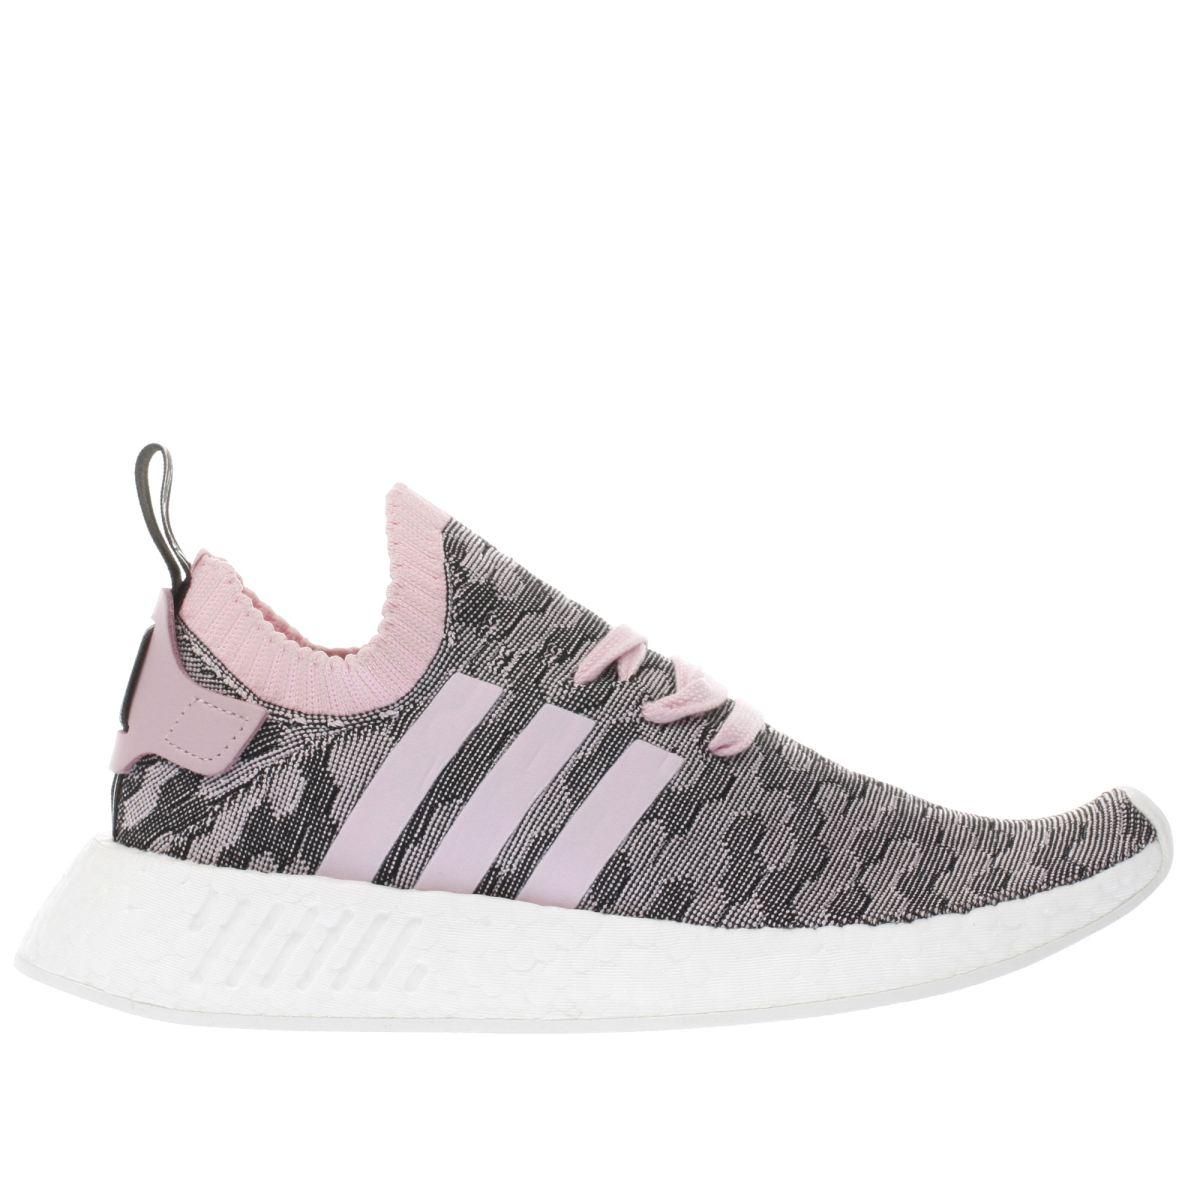 adidas pink & black nmd_r2 primeknit trainers